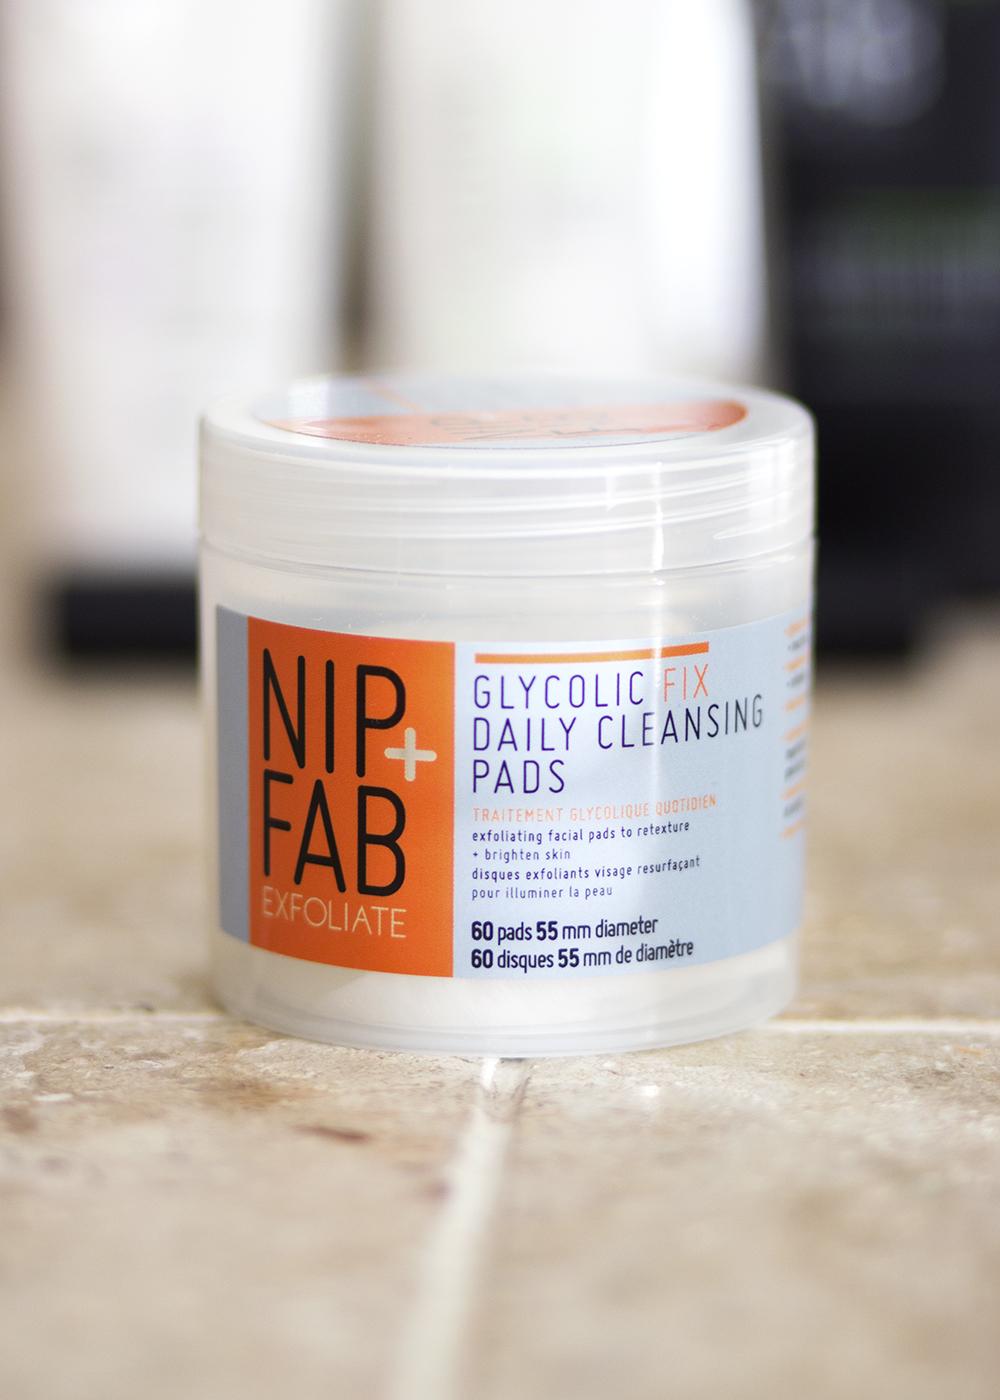 Rodial and Nip + Fab Beauty - Nip + Fab Exfoliate Glycolic Fix Daily Cleansing Pads - Rodial Nip Fab Beauty Review